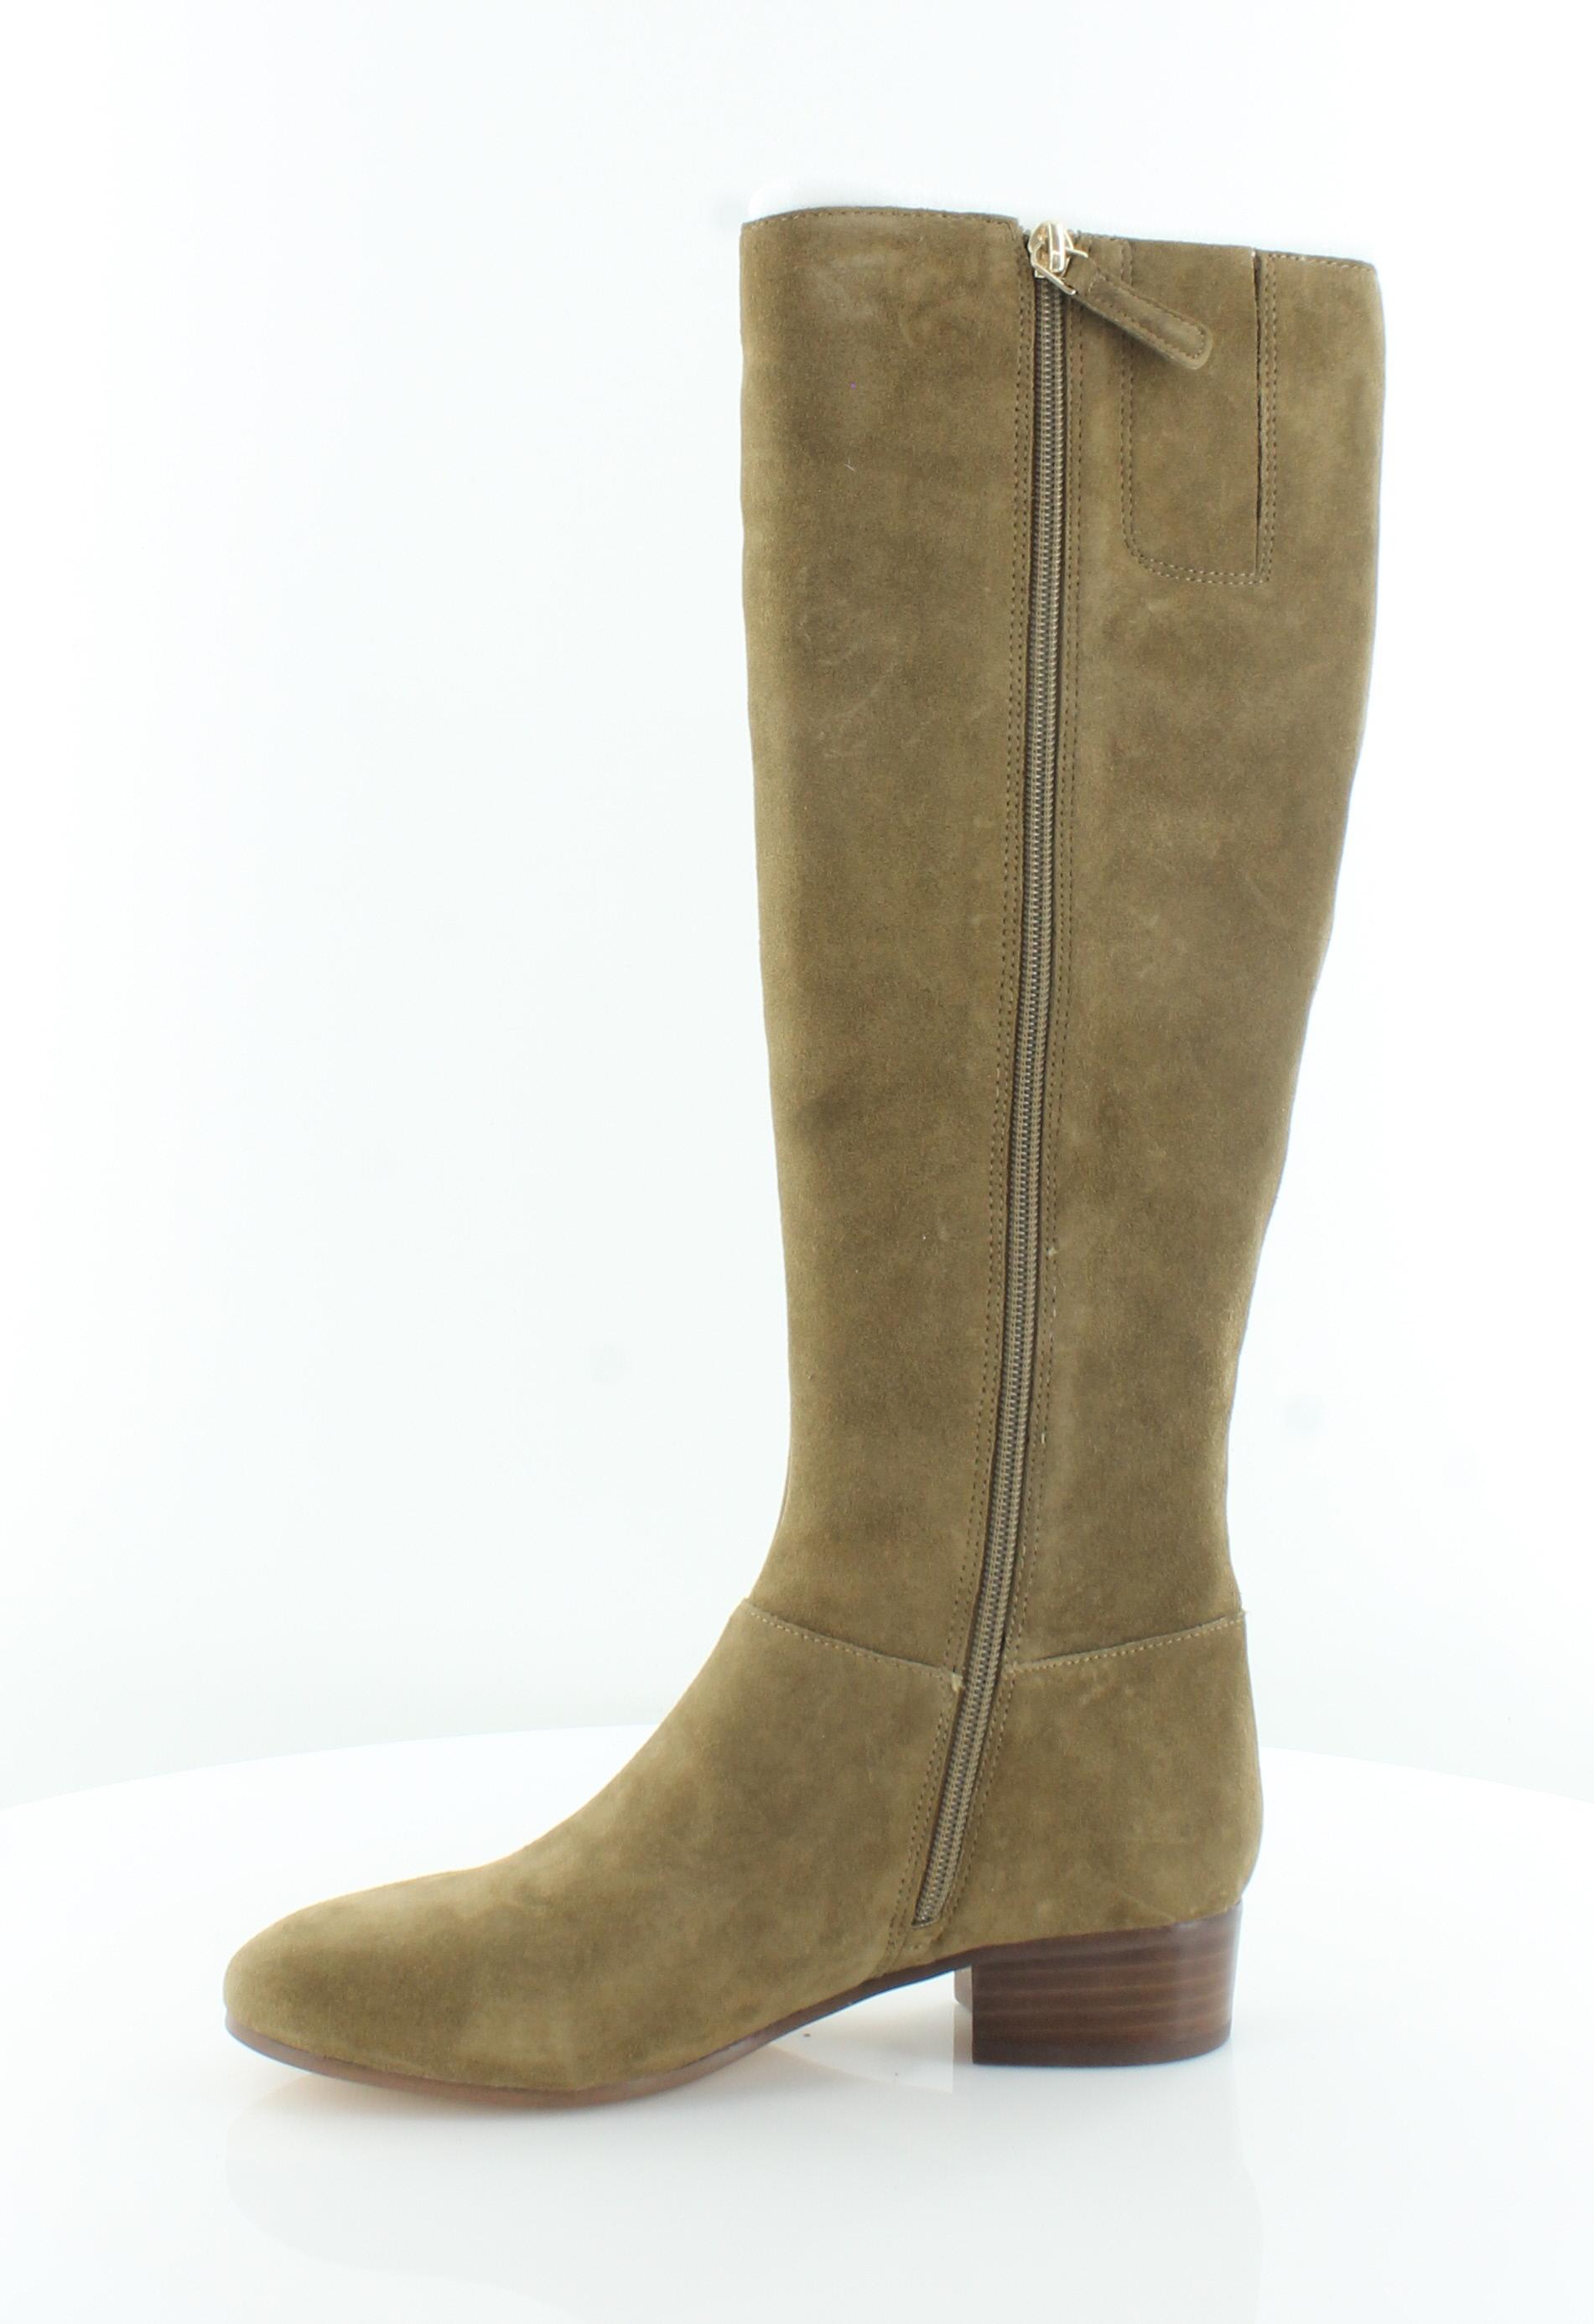 293164a1812 Nine-West-Oreyan-Women-039-s-Boots-Green thumbnail